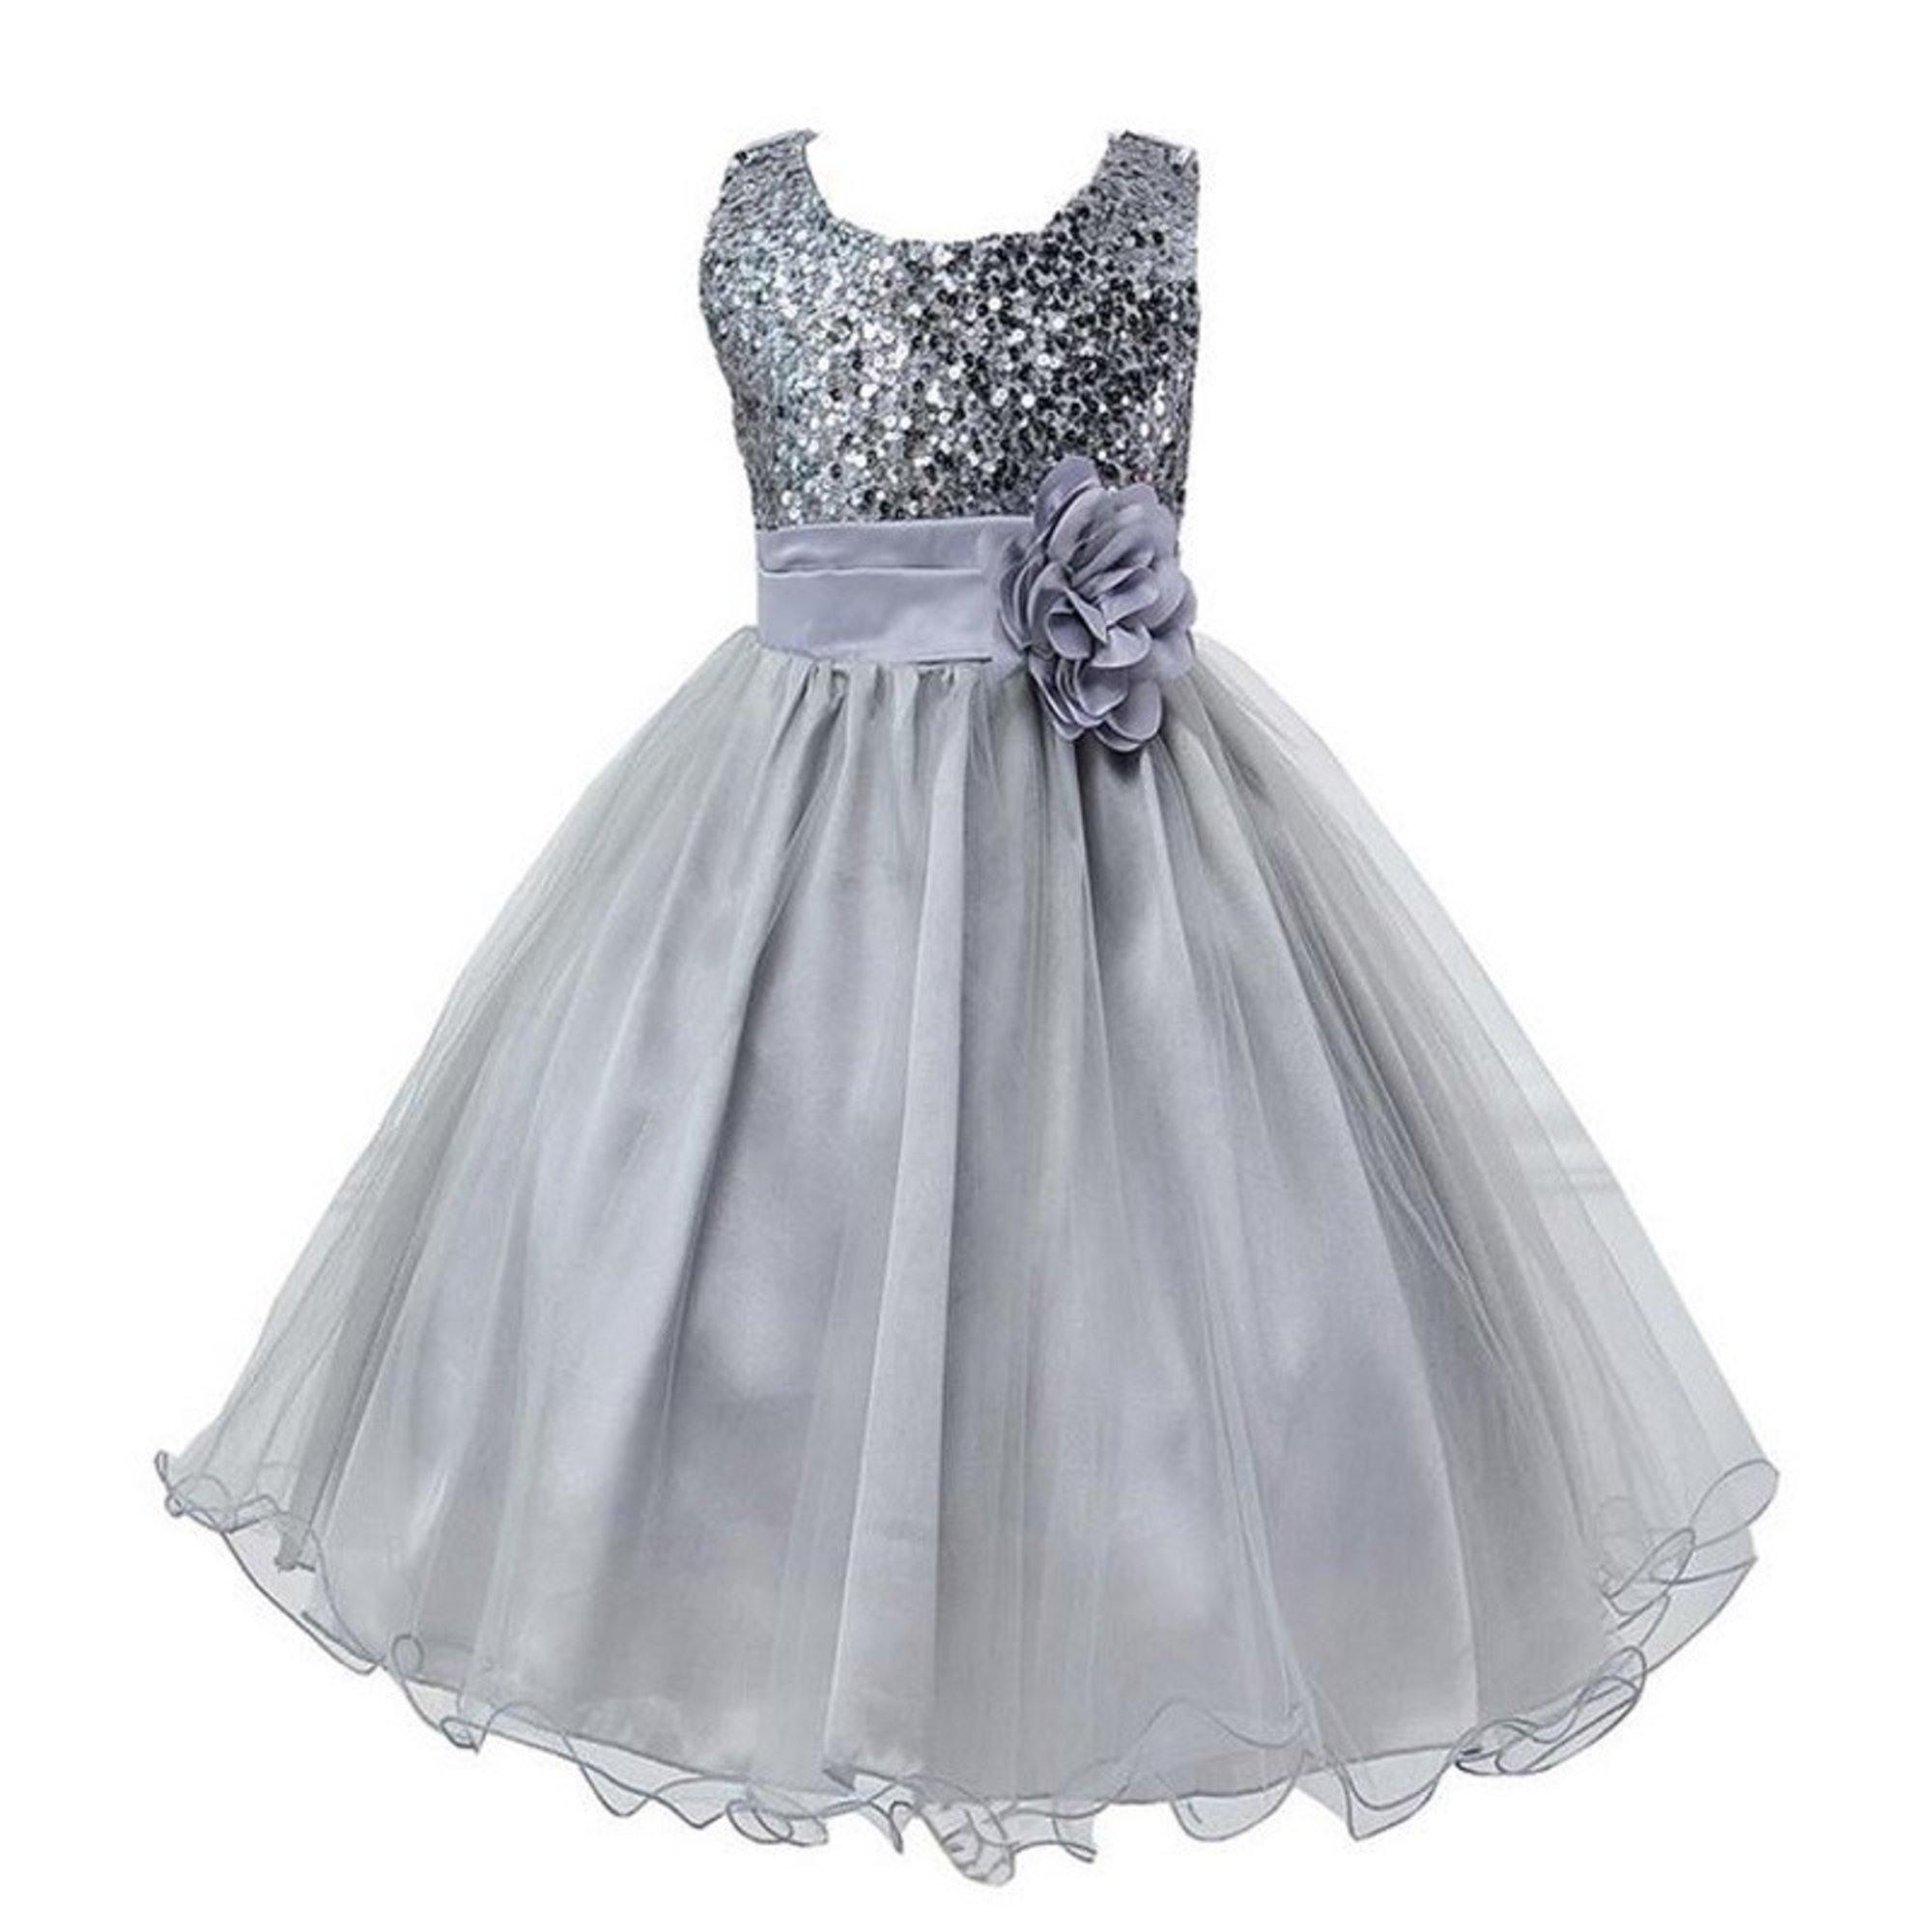 Formal Spektakulär Kleid Mit Tüllrock Bester Preis Coolste Kleid Mit Tüllrock Spezialgebiet